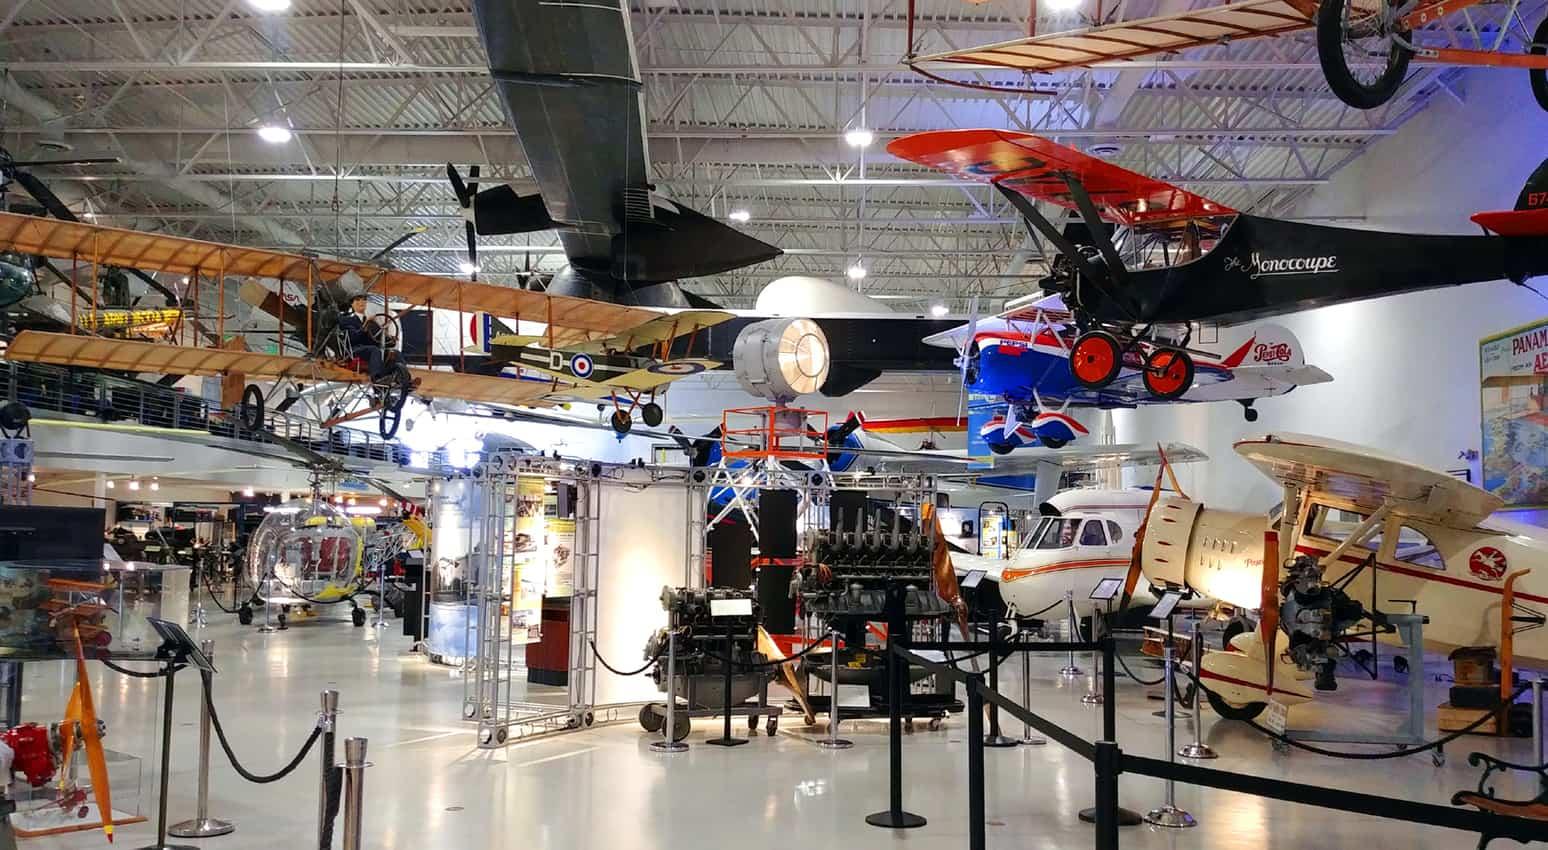 Hiller Aviation Museum in California.